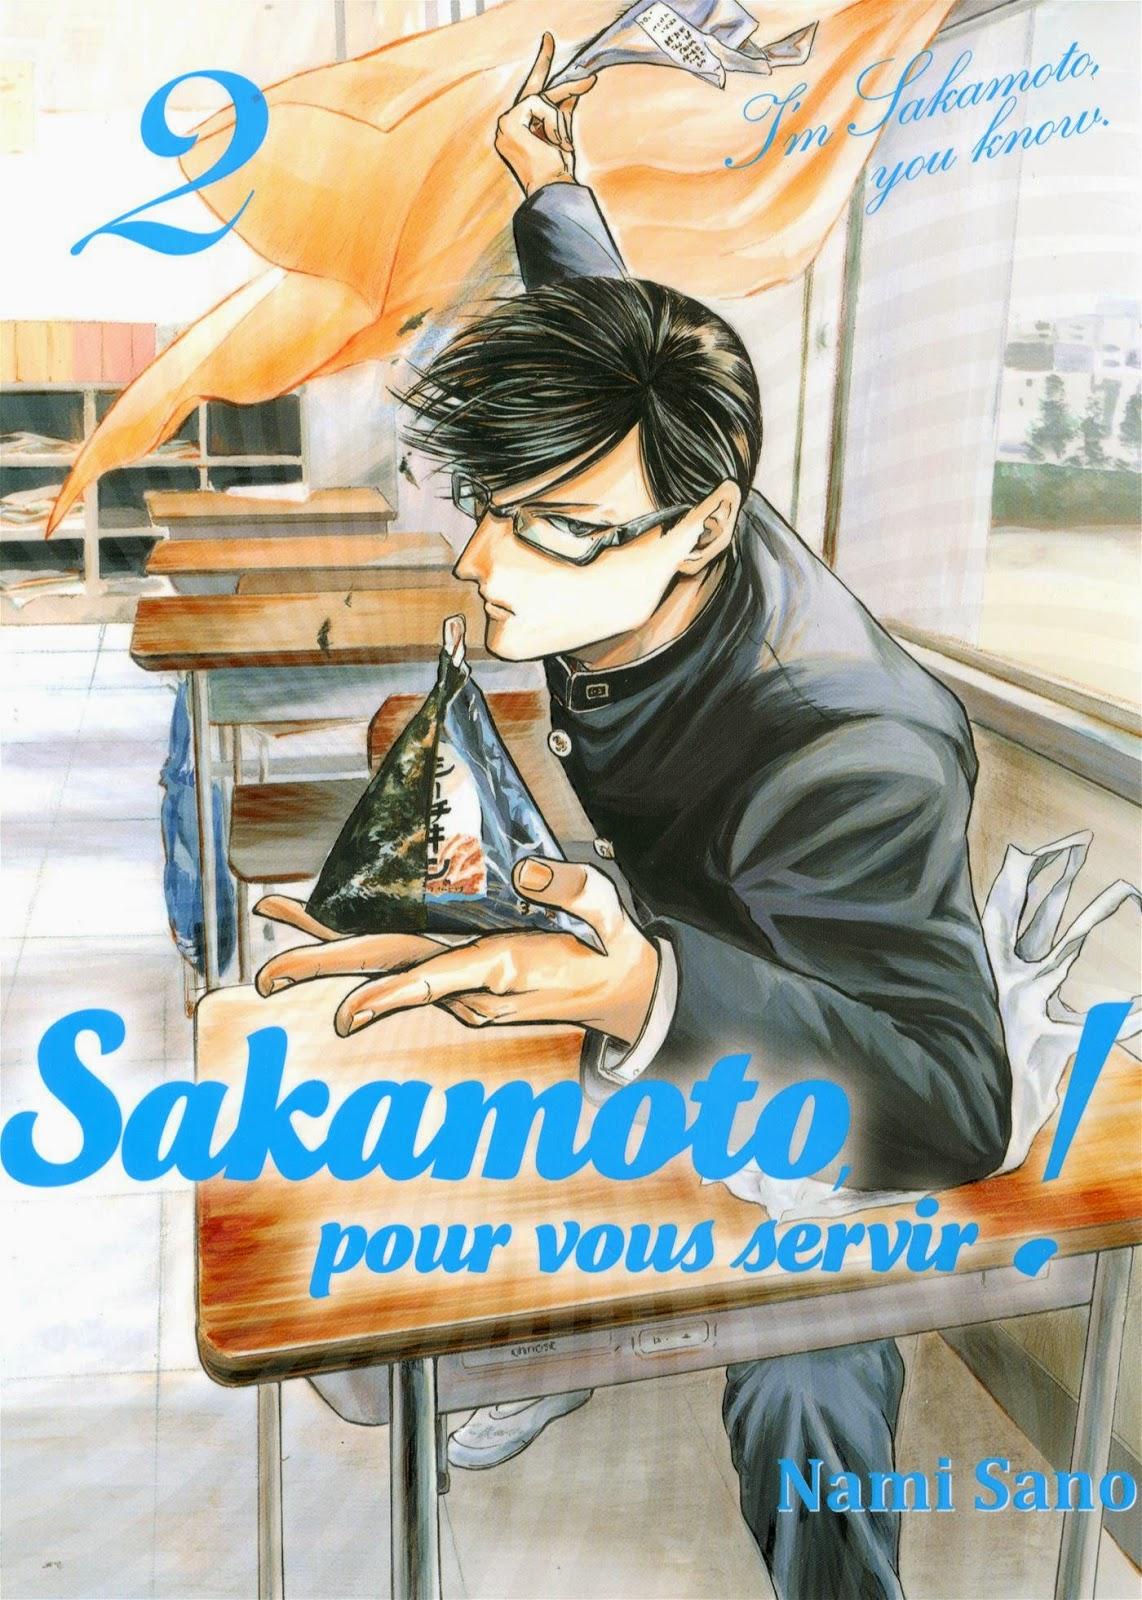 Sano, Nami - Sakamoto pour vous servir !